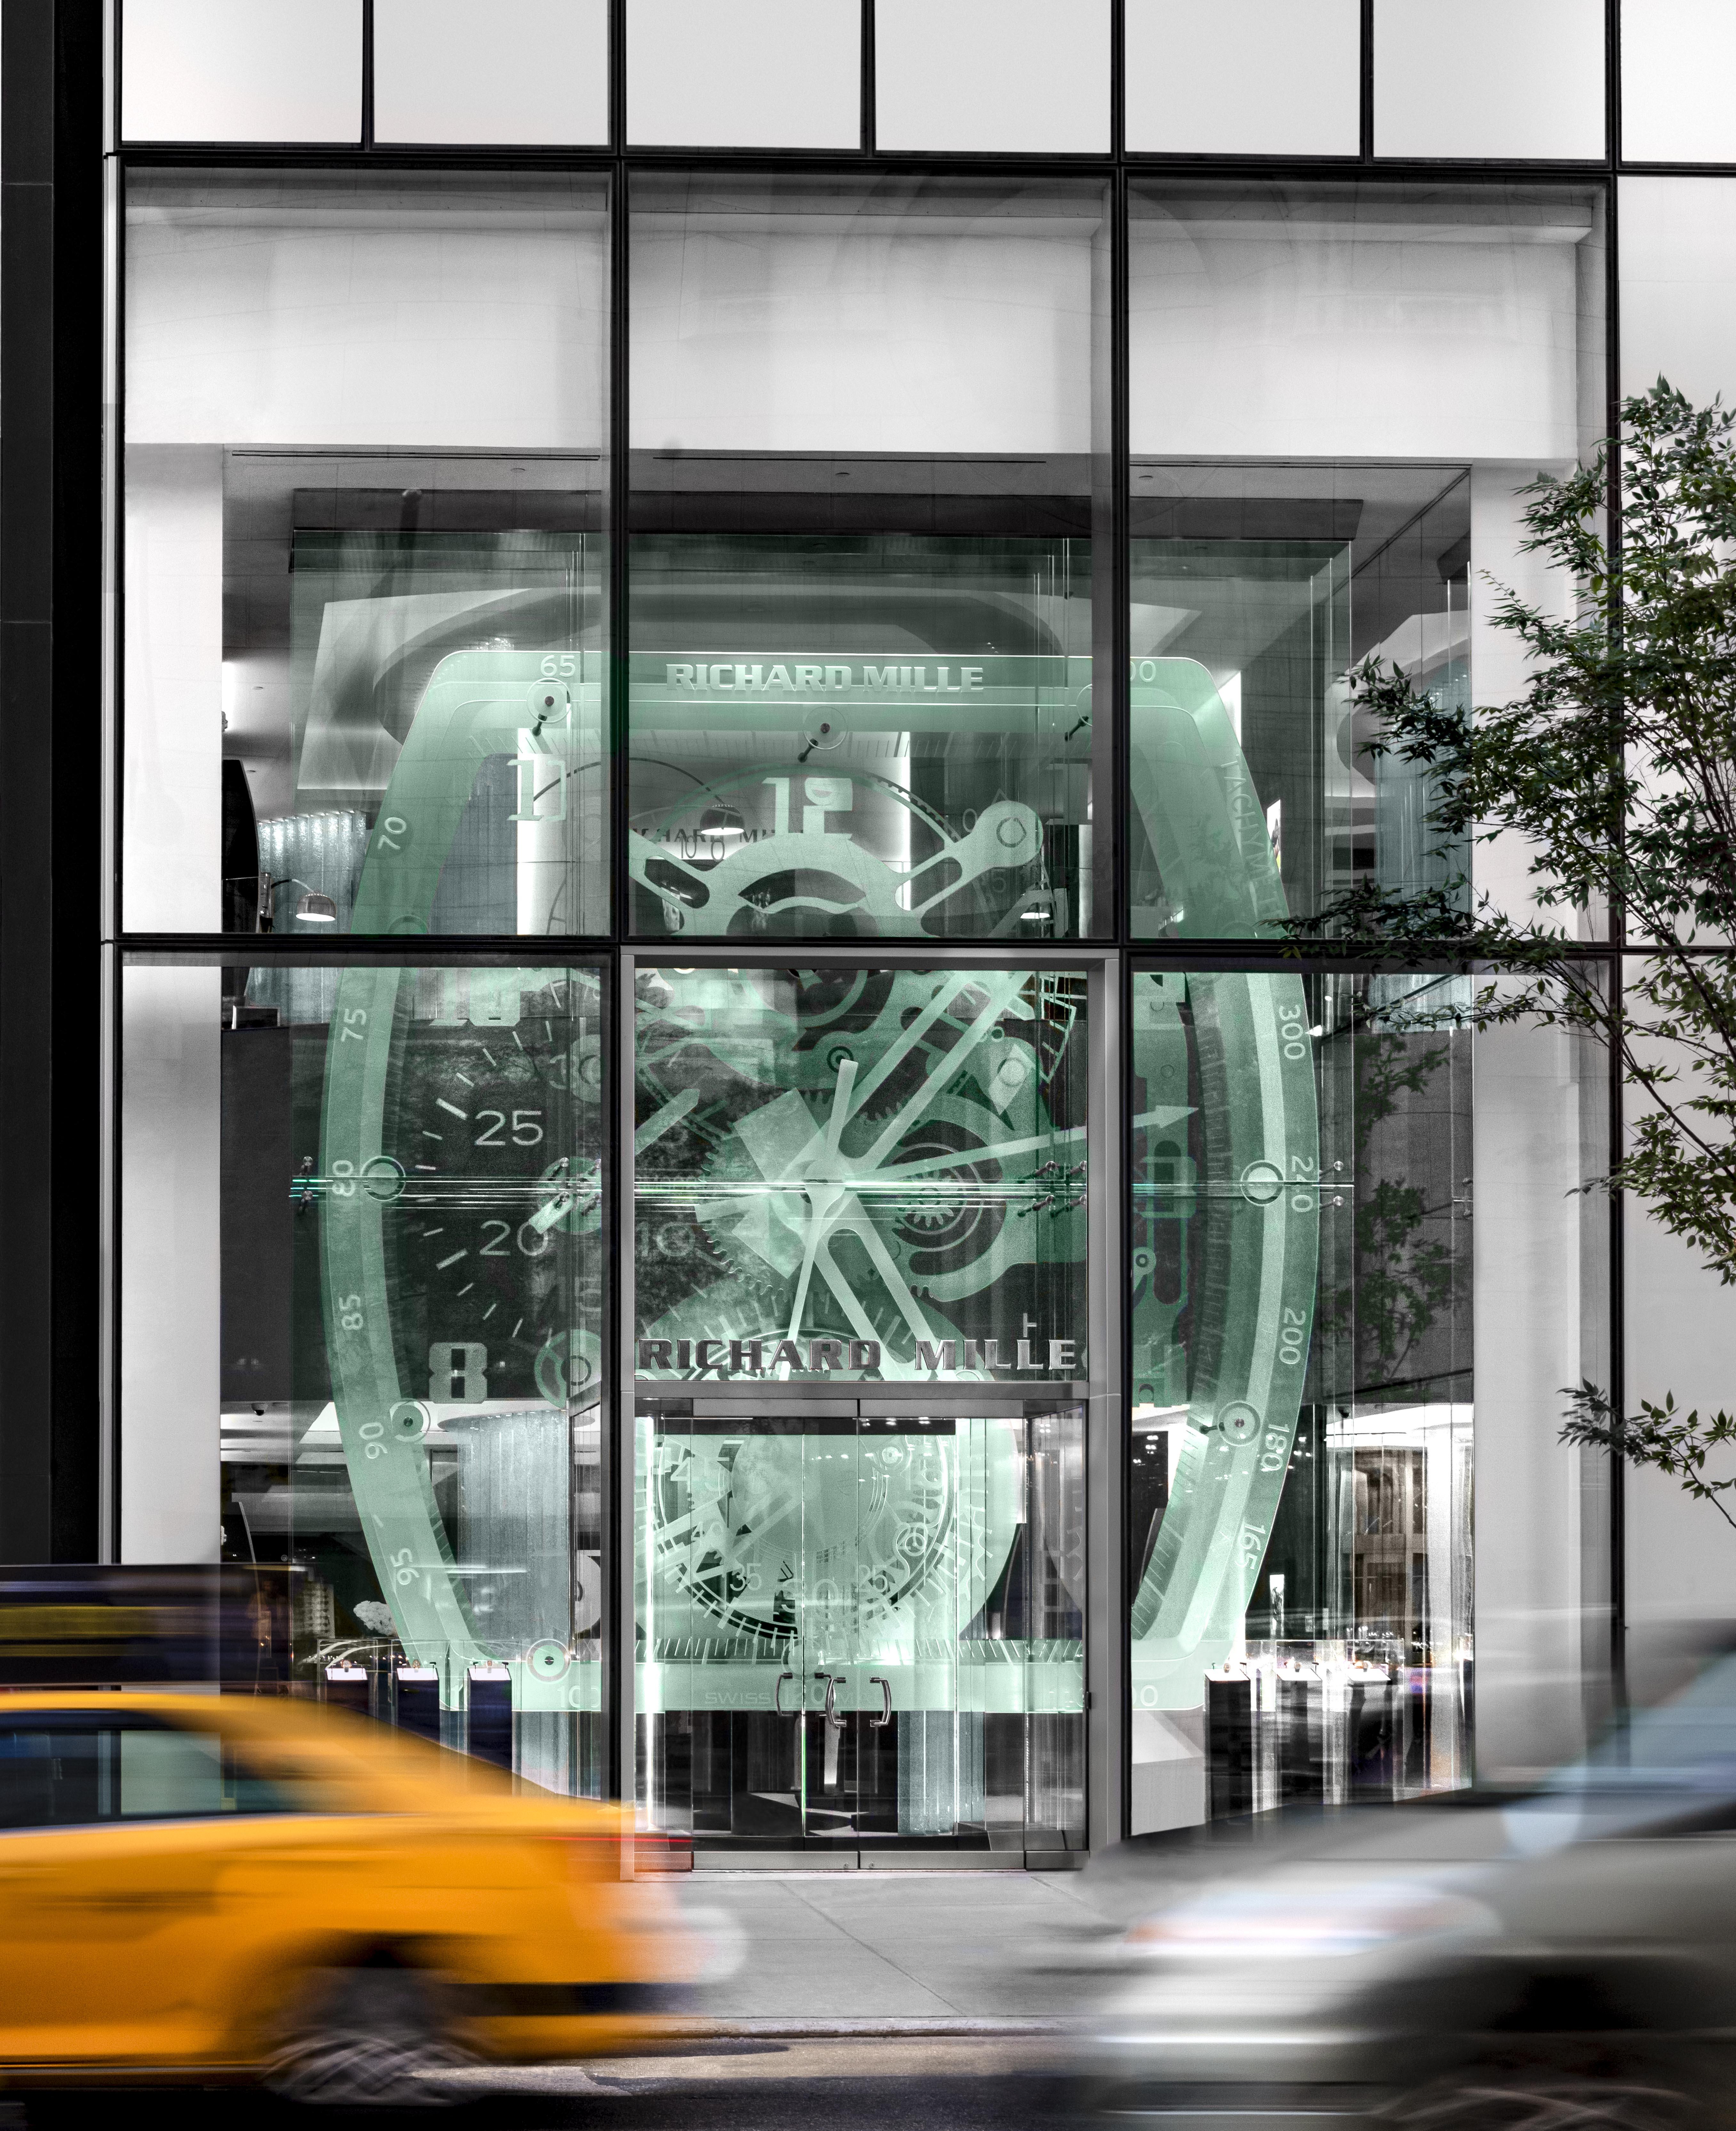 Richard Mille - New York